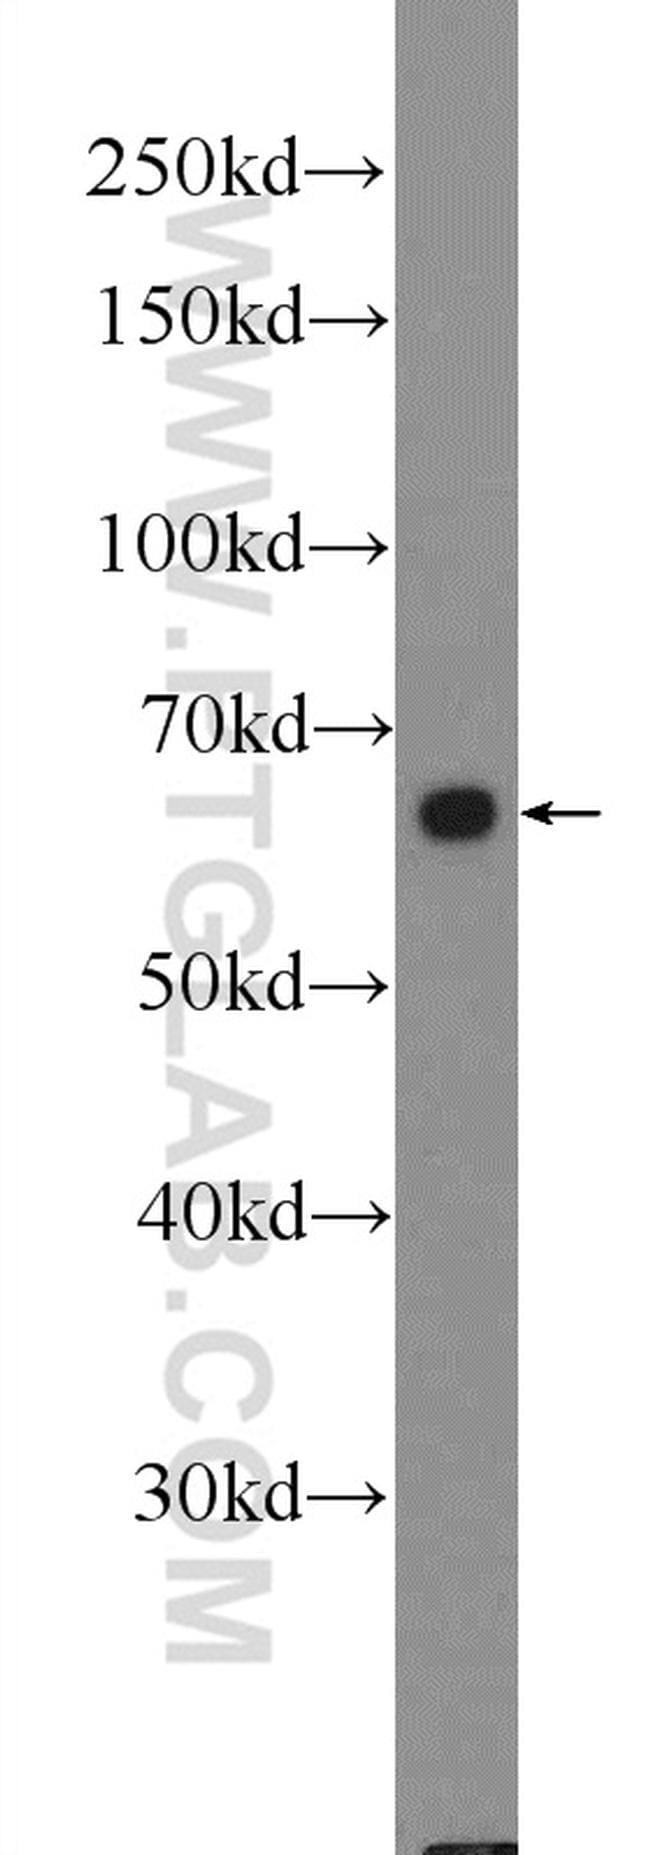 FZD5 Antibody in Western Blot (WB)